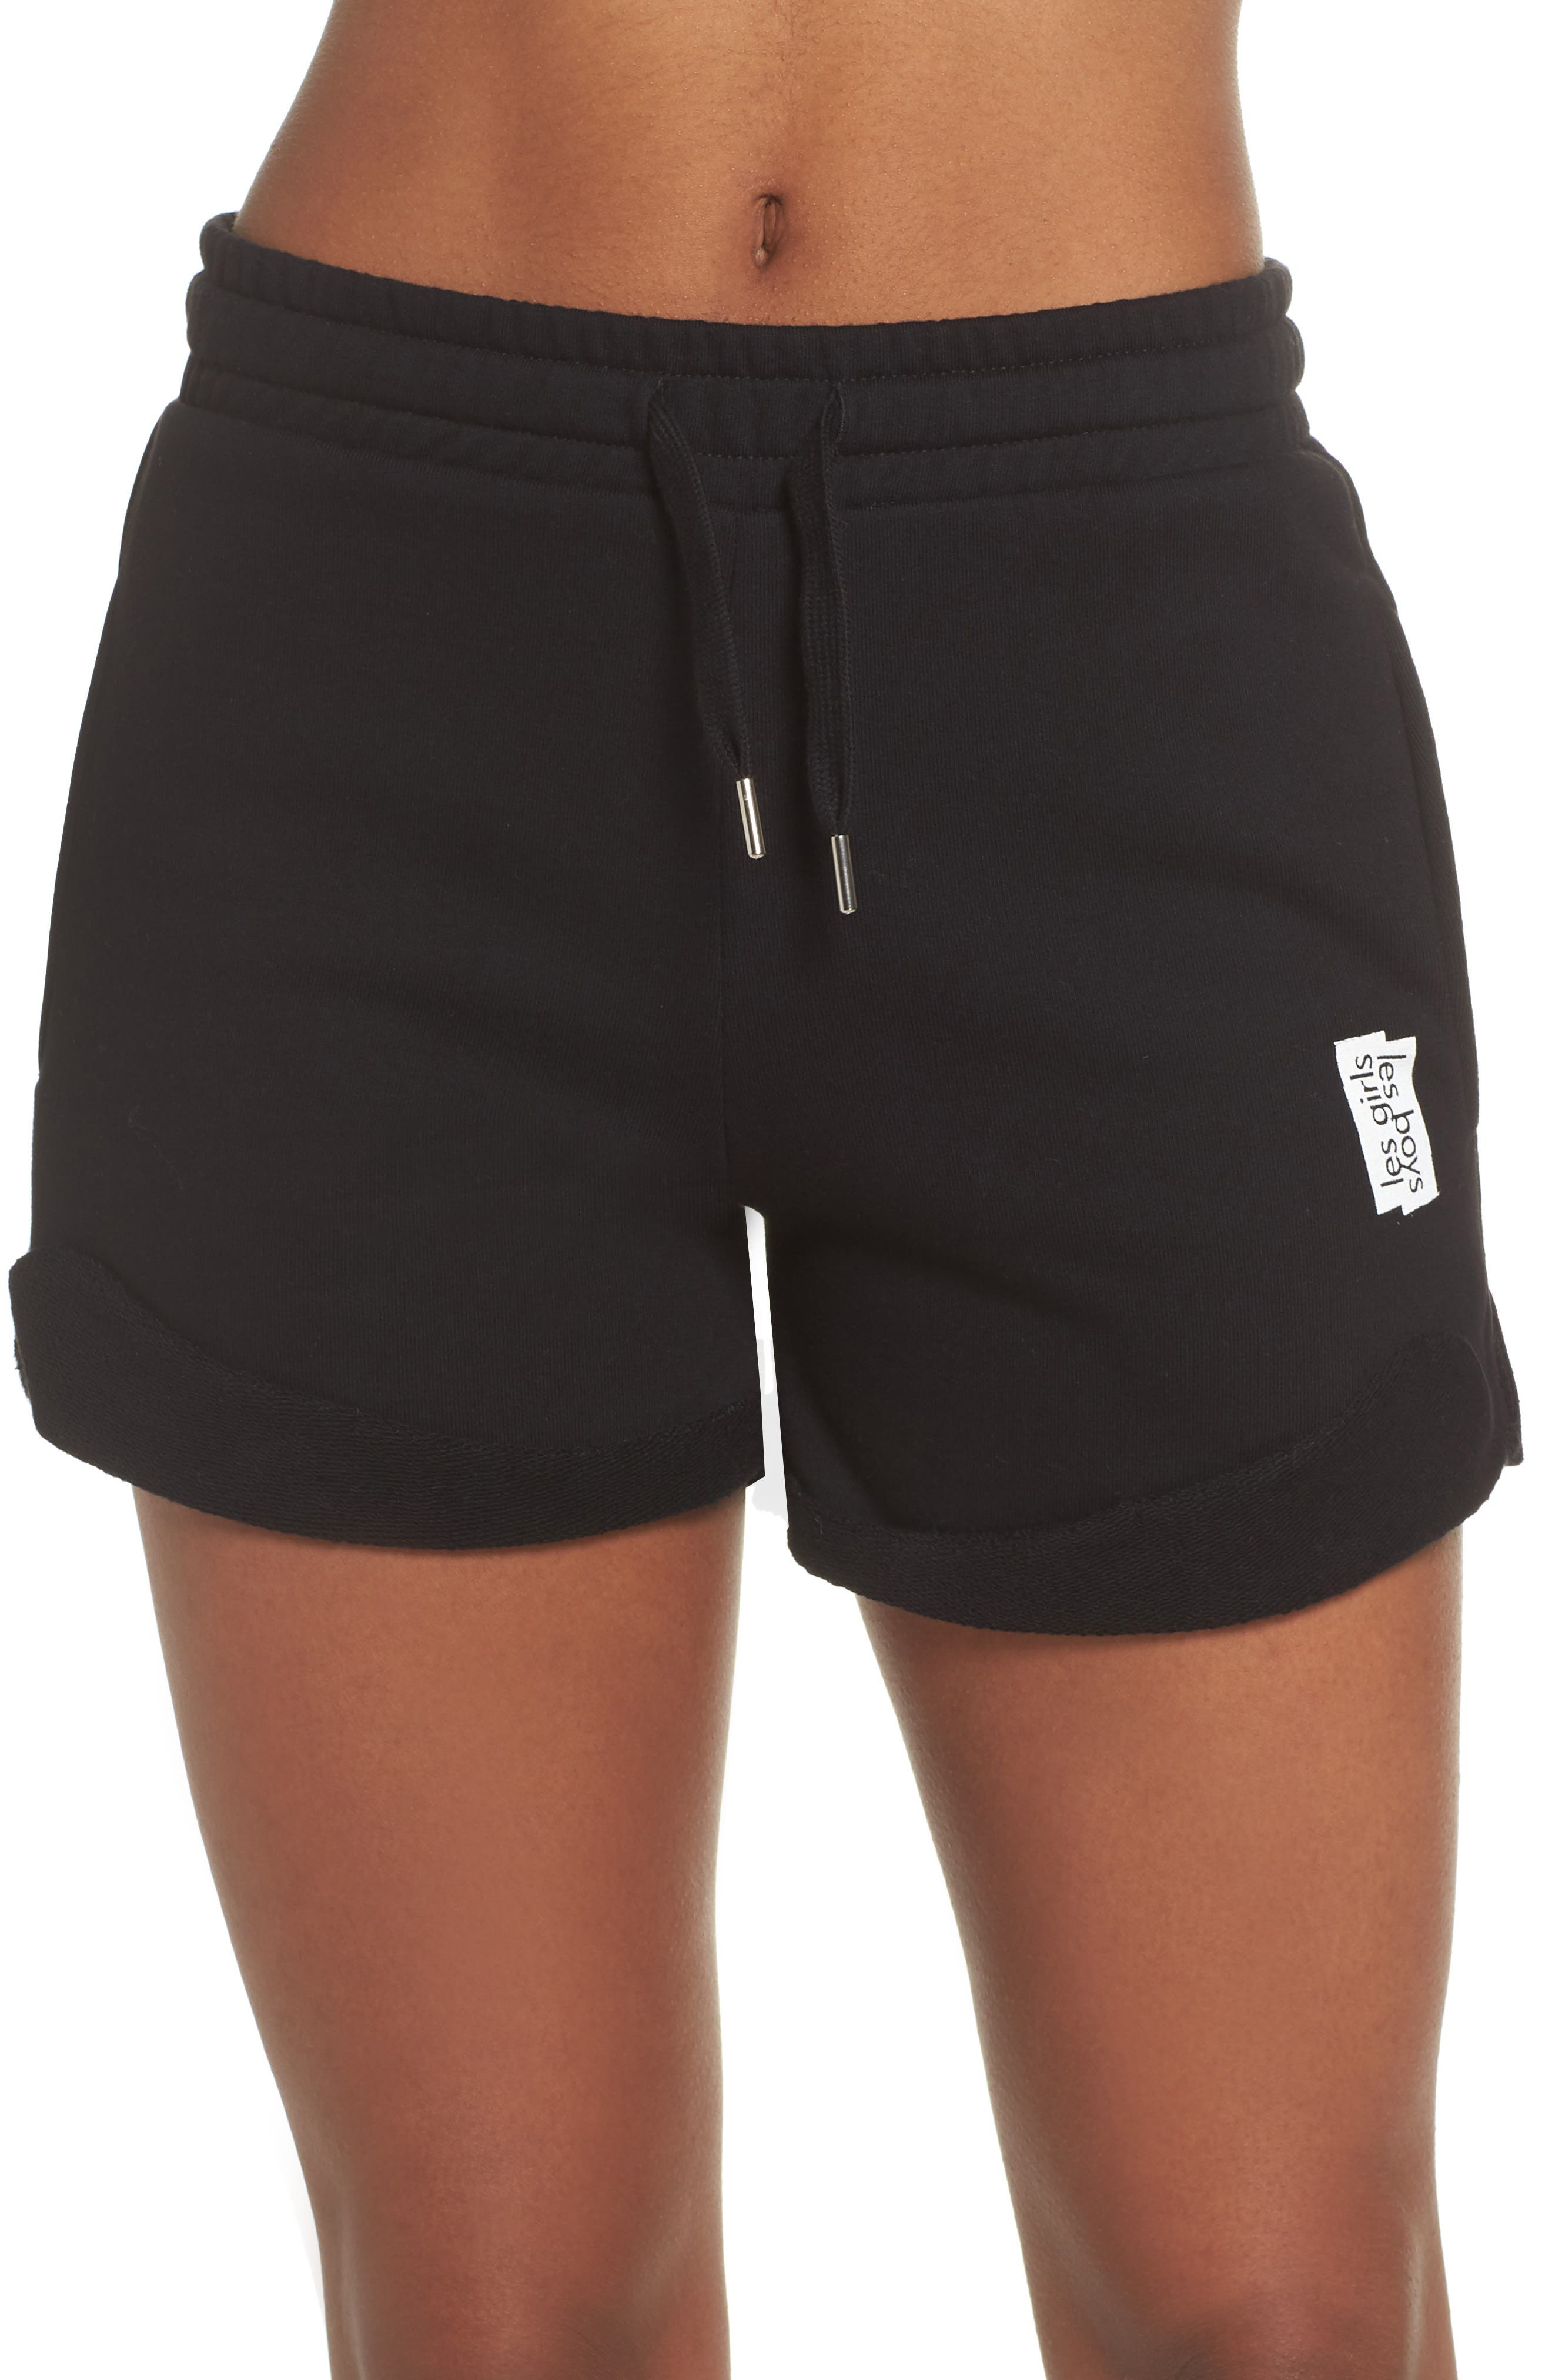 French Terry High Waist Shorts,                             Main thumbnail 1, color,